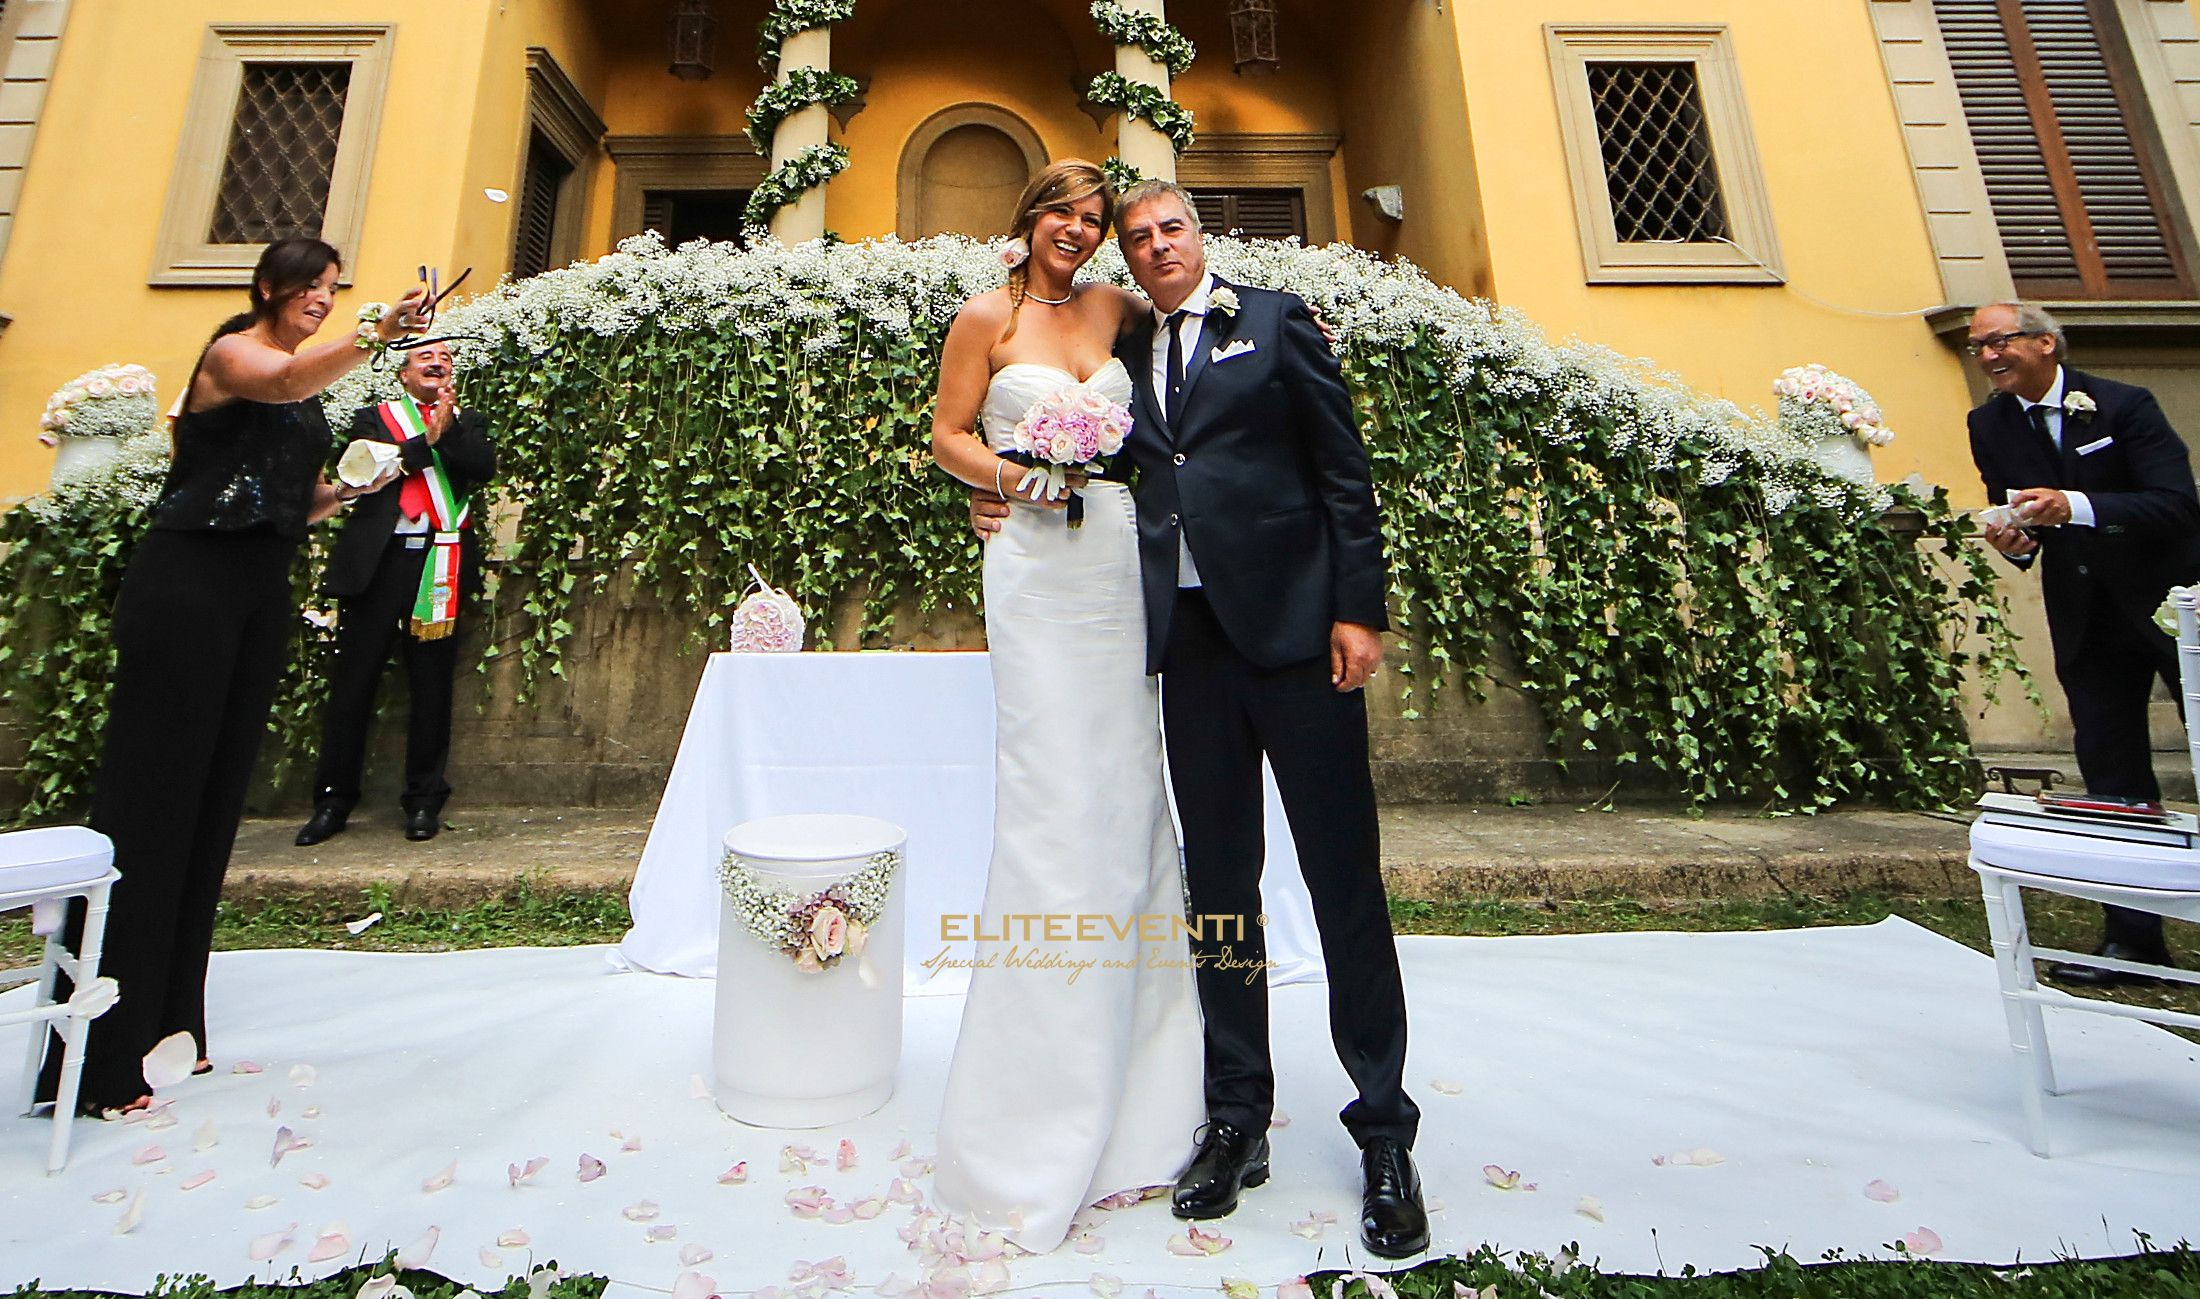 Tuscany_Wedding_by_Eliteeventi